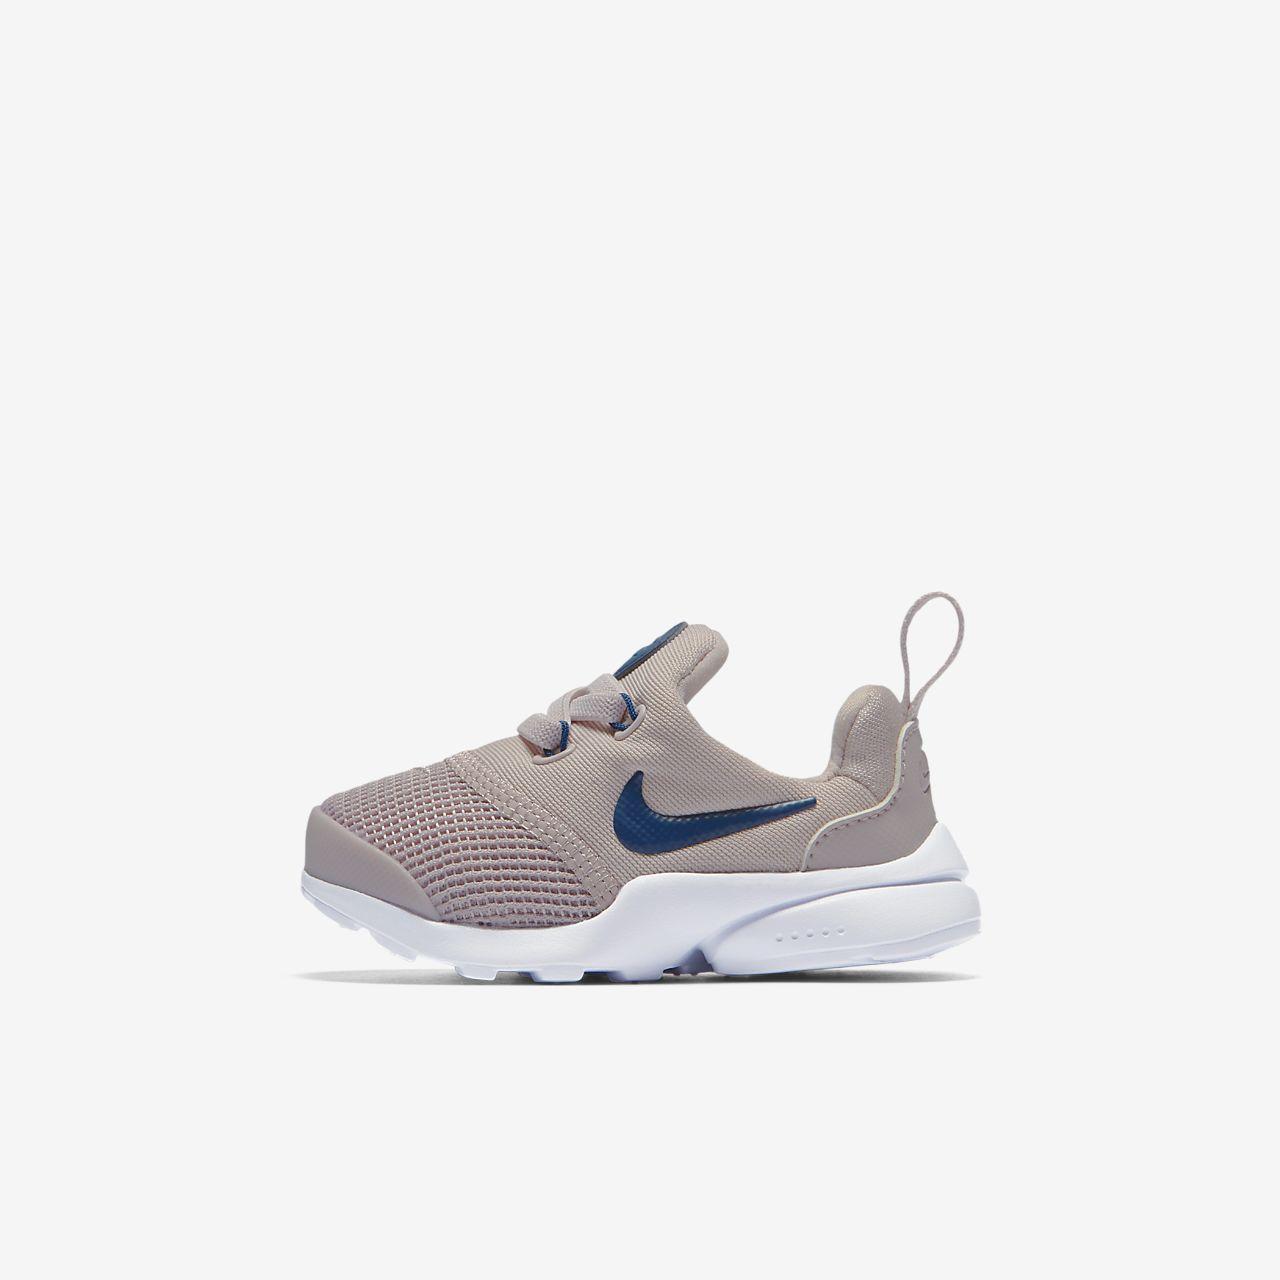 412ab01099f71 Nike Presto Fly Infant Toddler Shoe